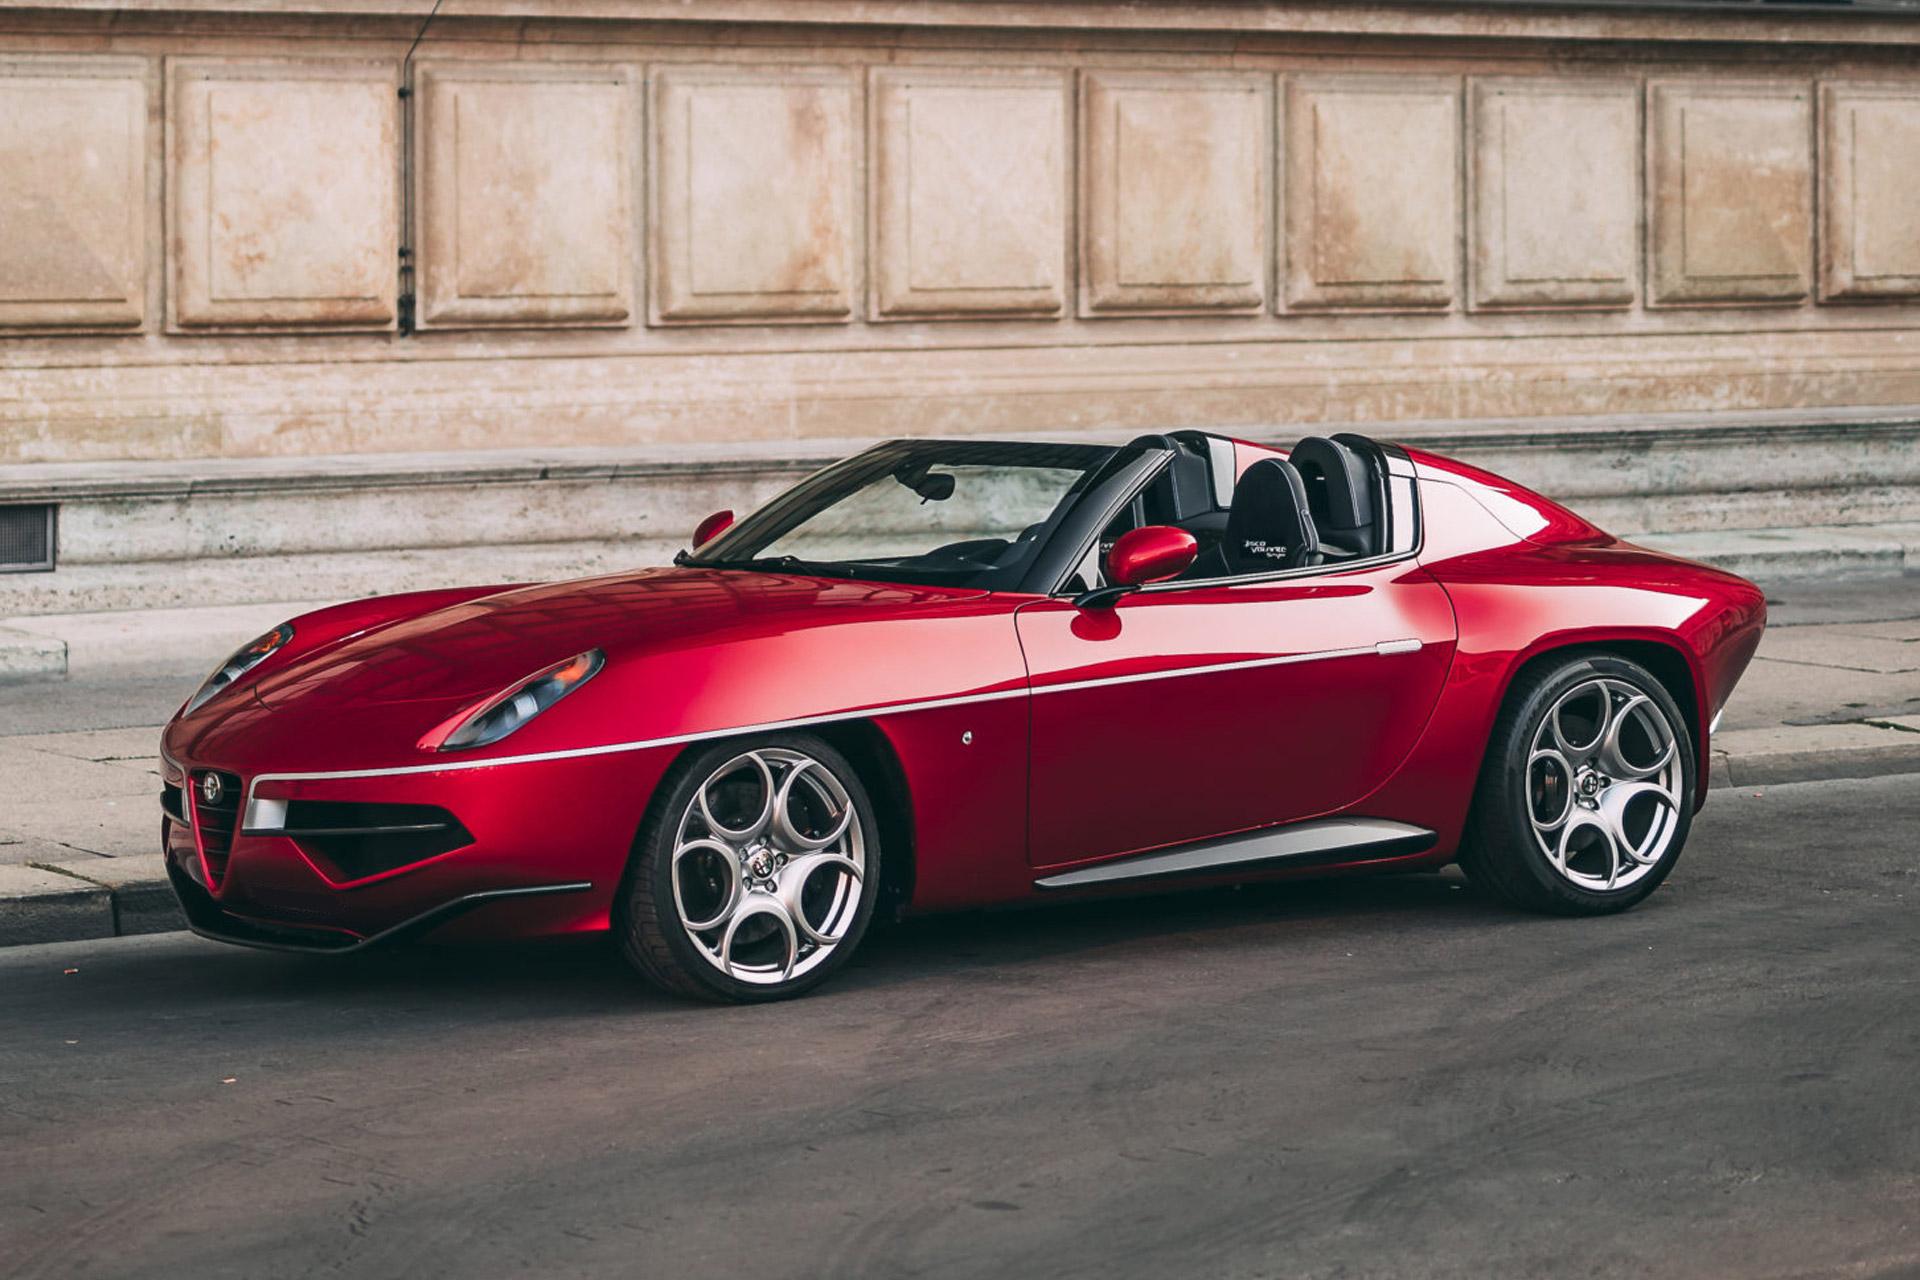 2017 Alfa Romeo Disco Volante Spyder